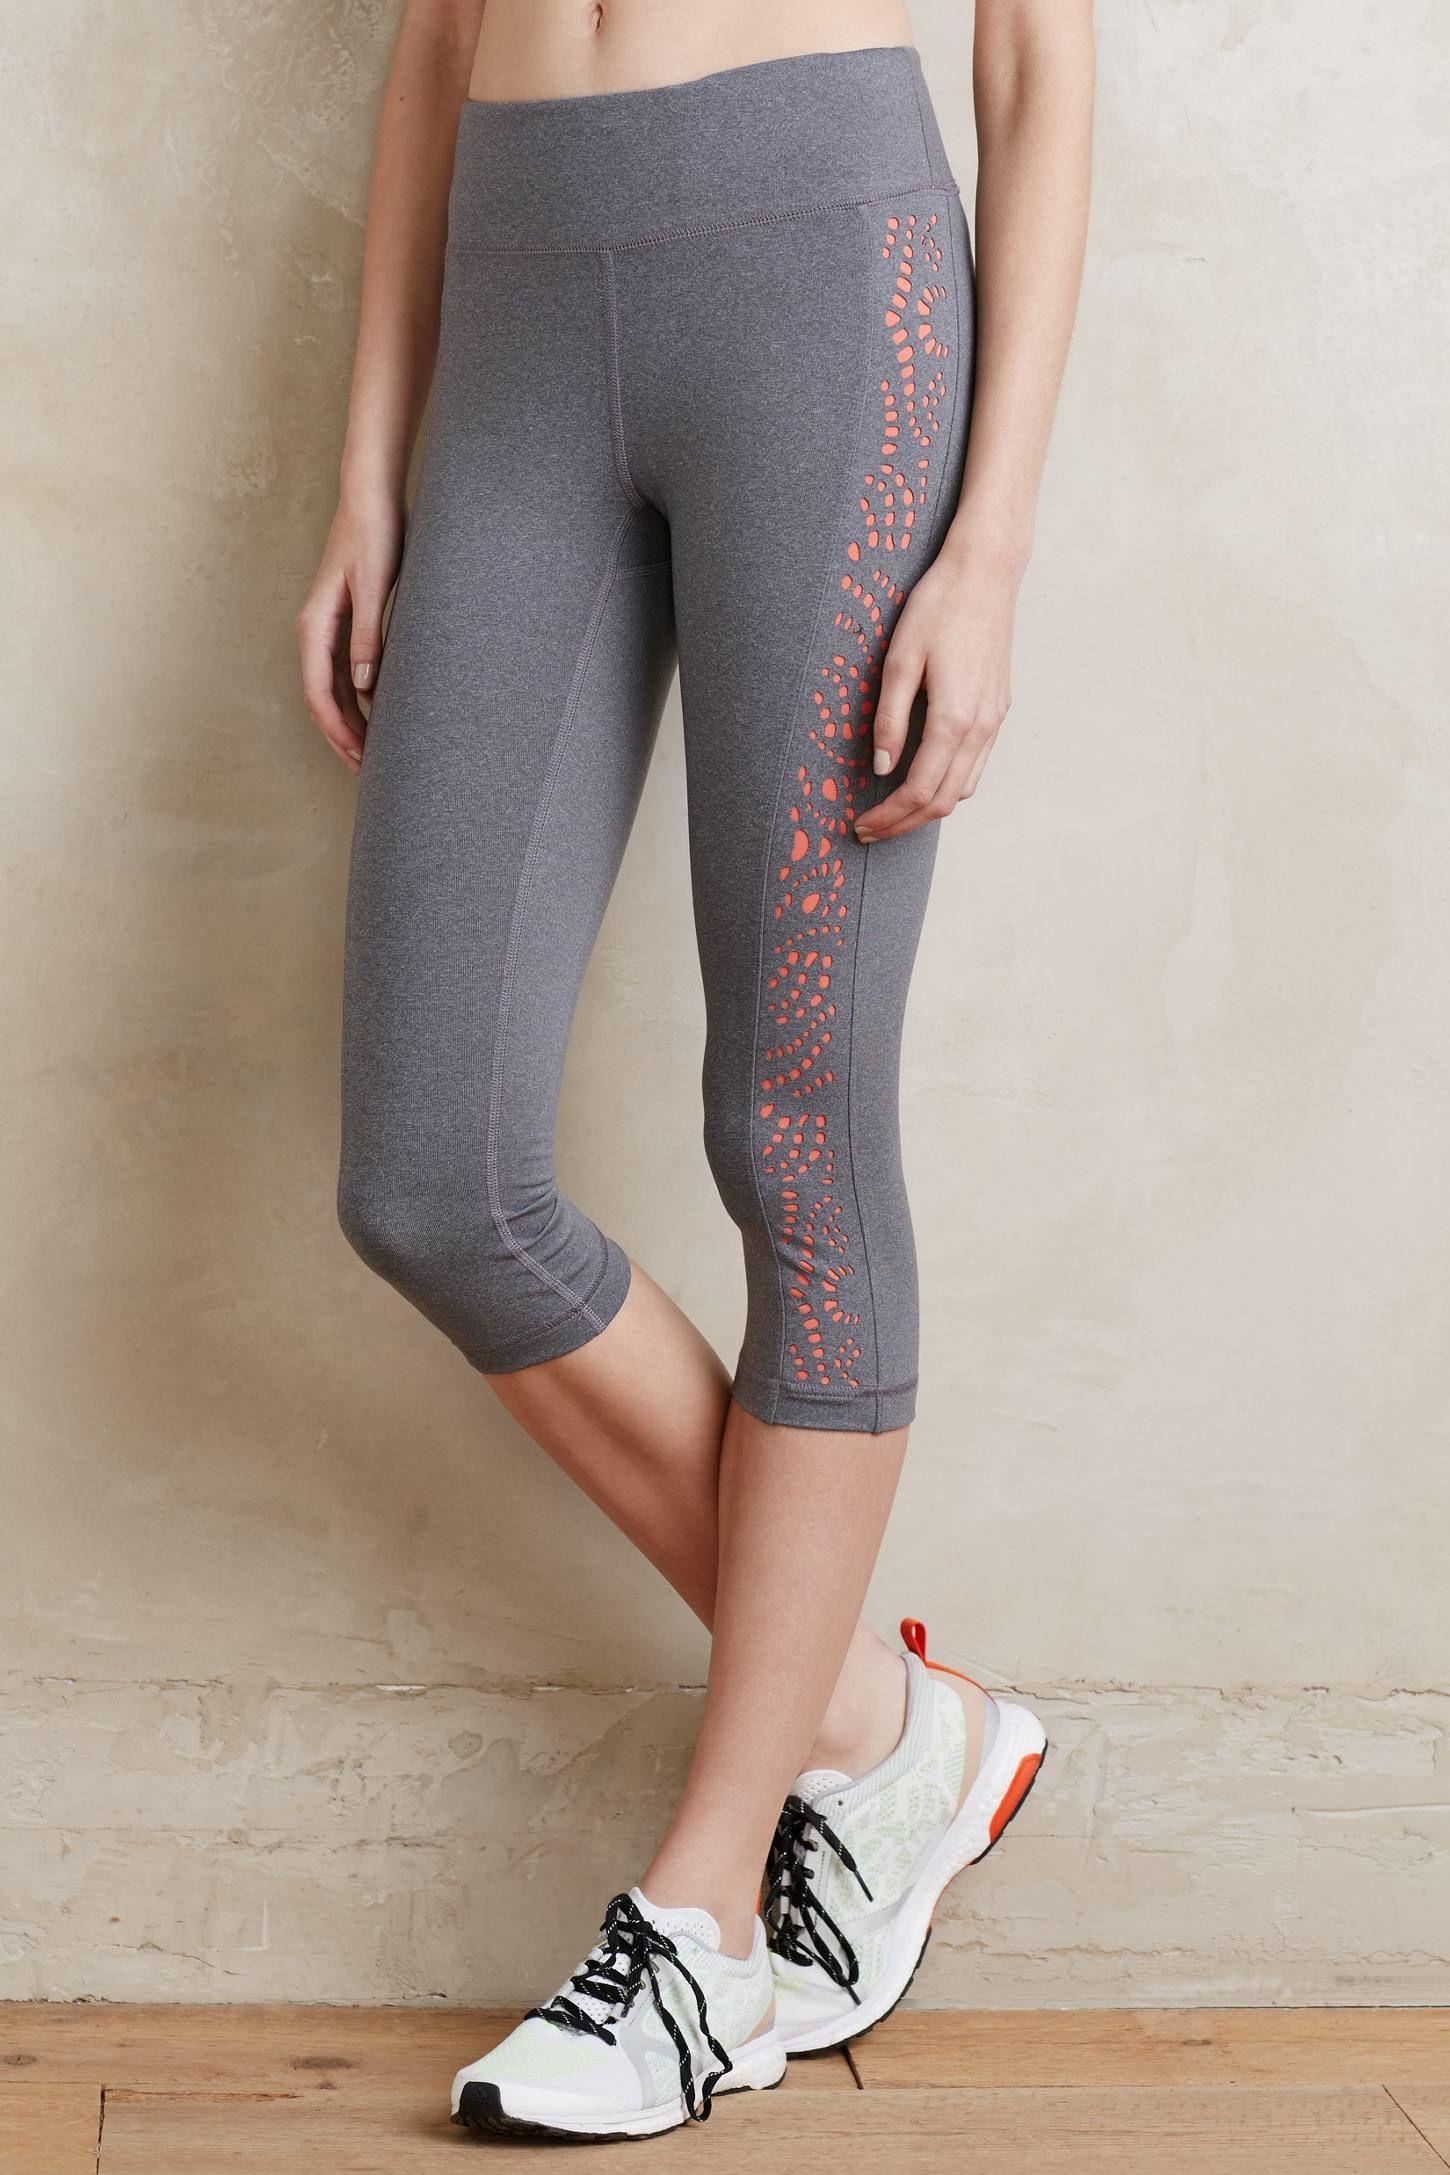 d4818952b049af Women's Gray Laser-cut Cropped Leggings, Grey   Sold   Active wear ...